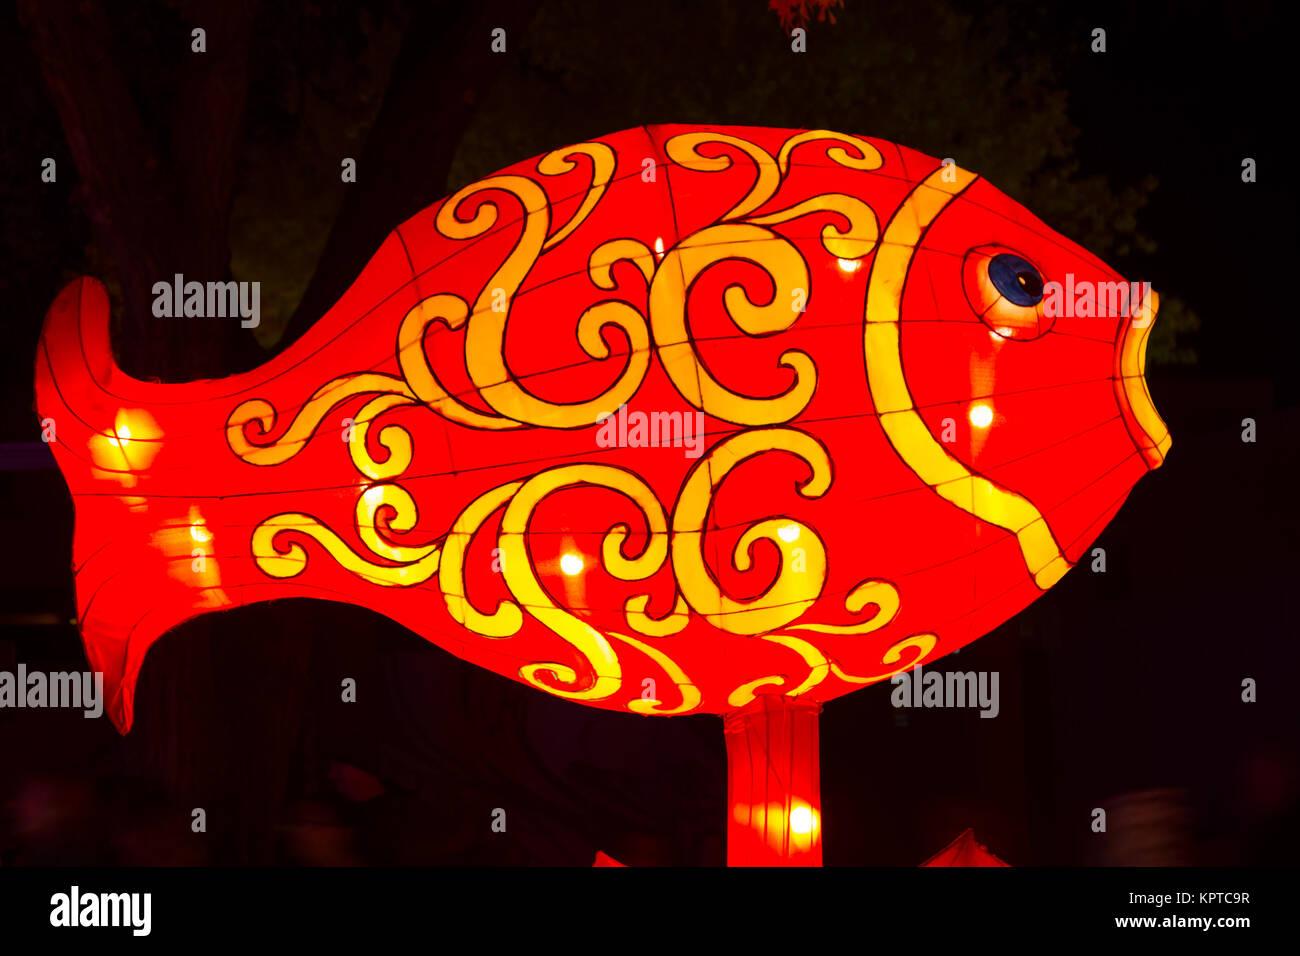 fish lantern stock photos fish lantern stock images alamy. Black Bedroom Furniture Sets. Home Design Ideas